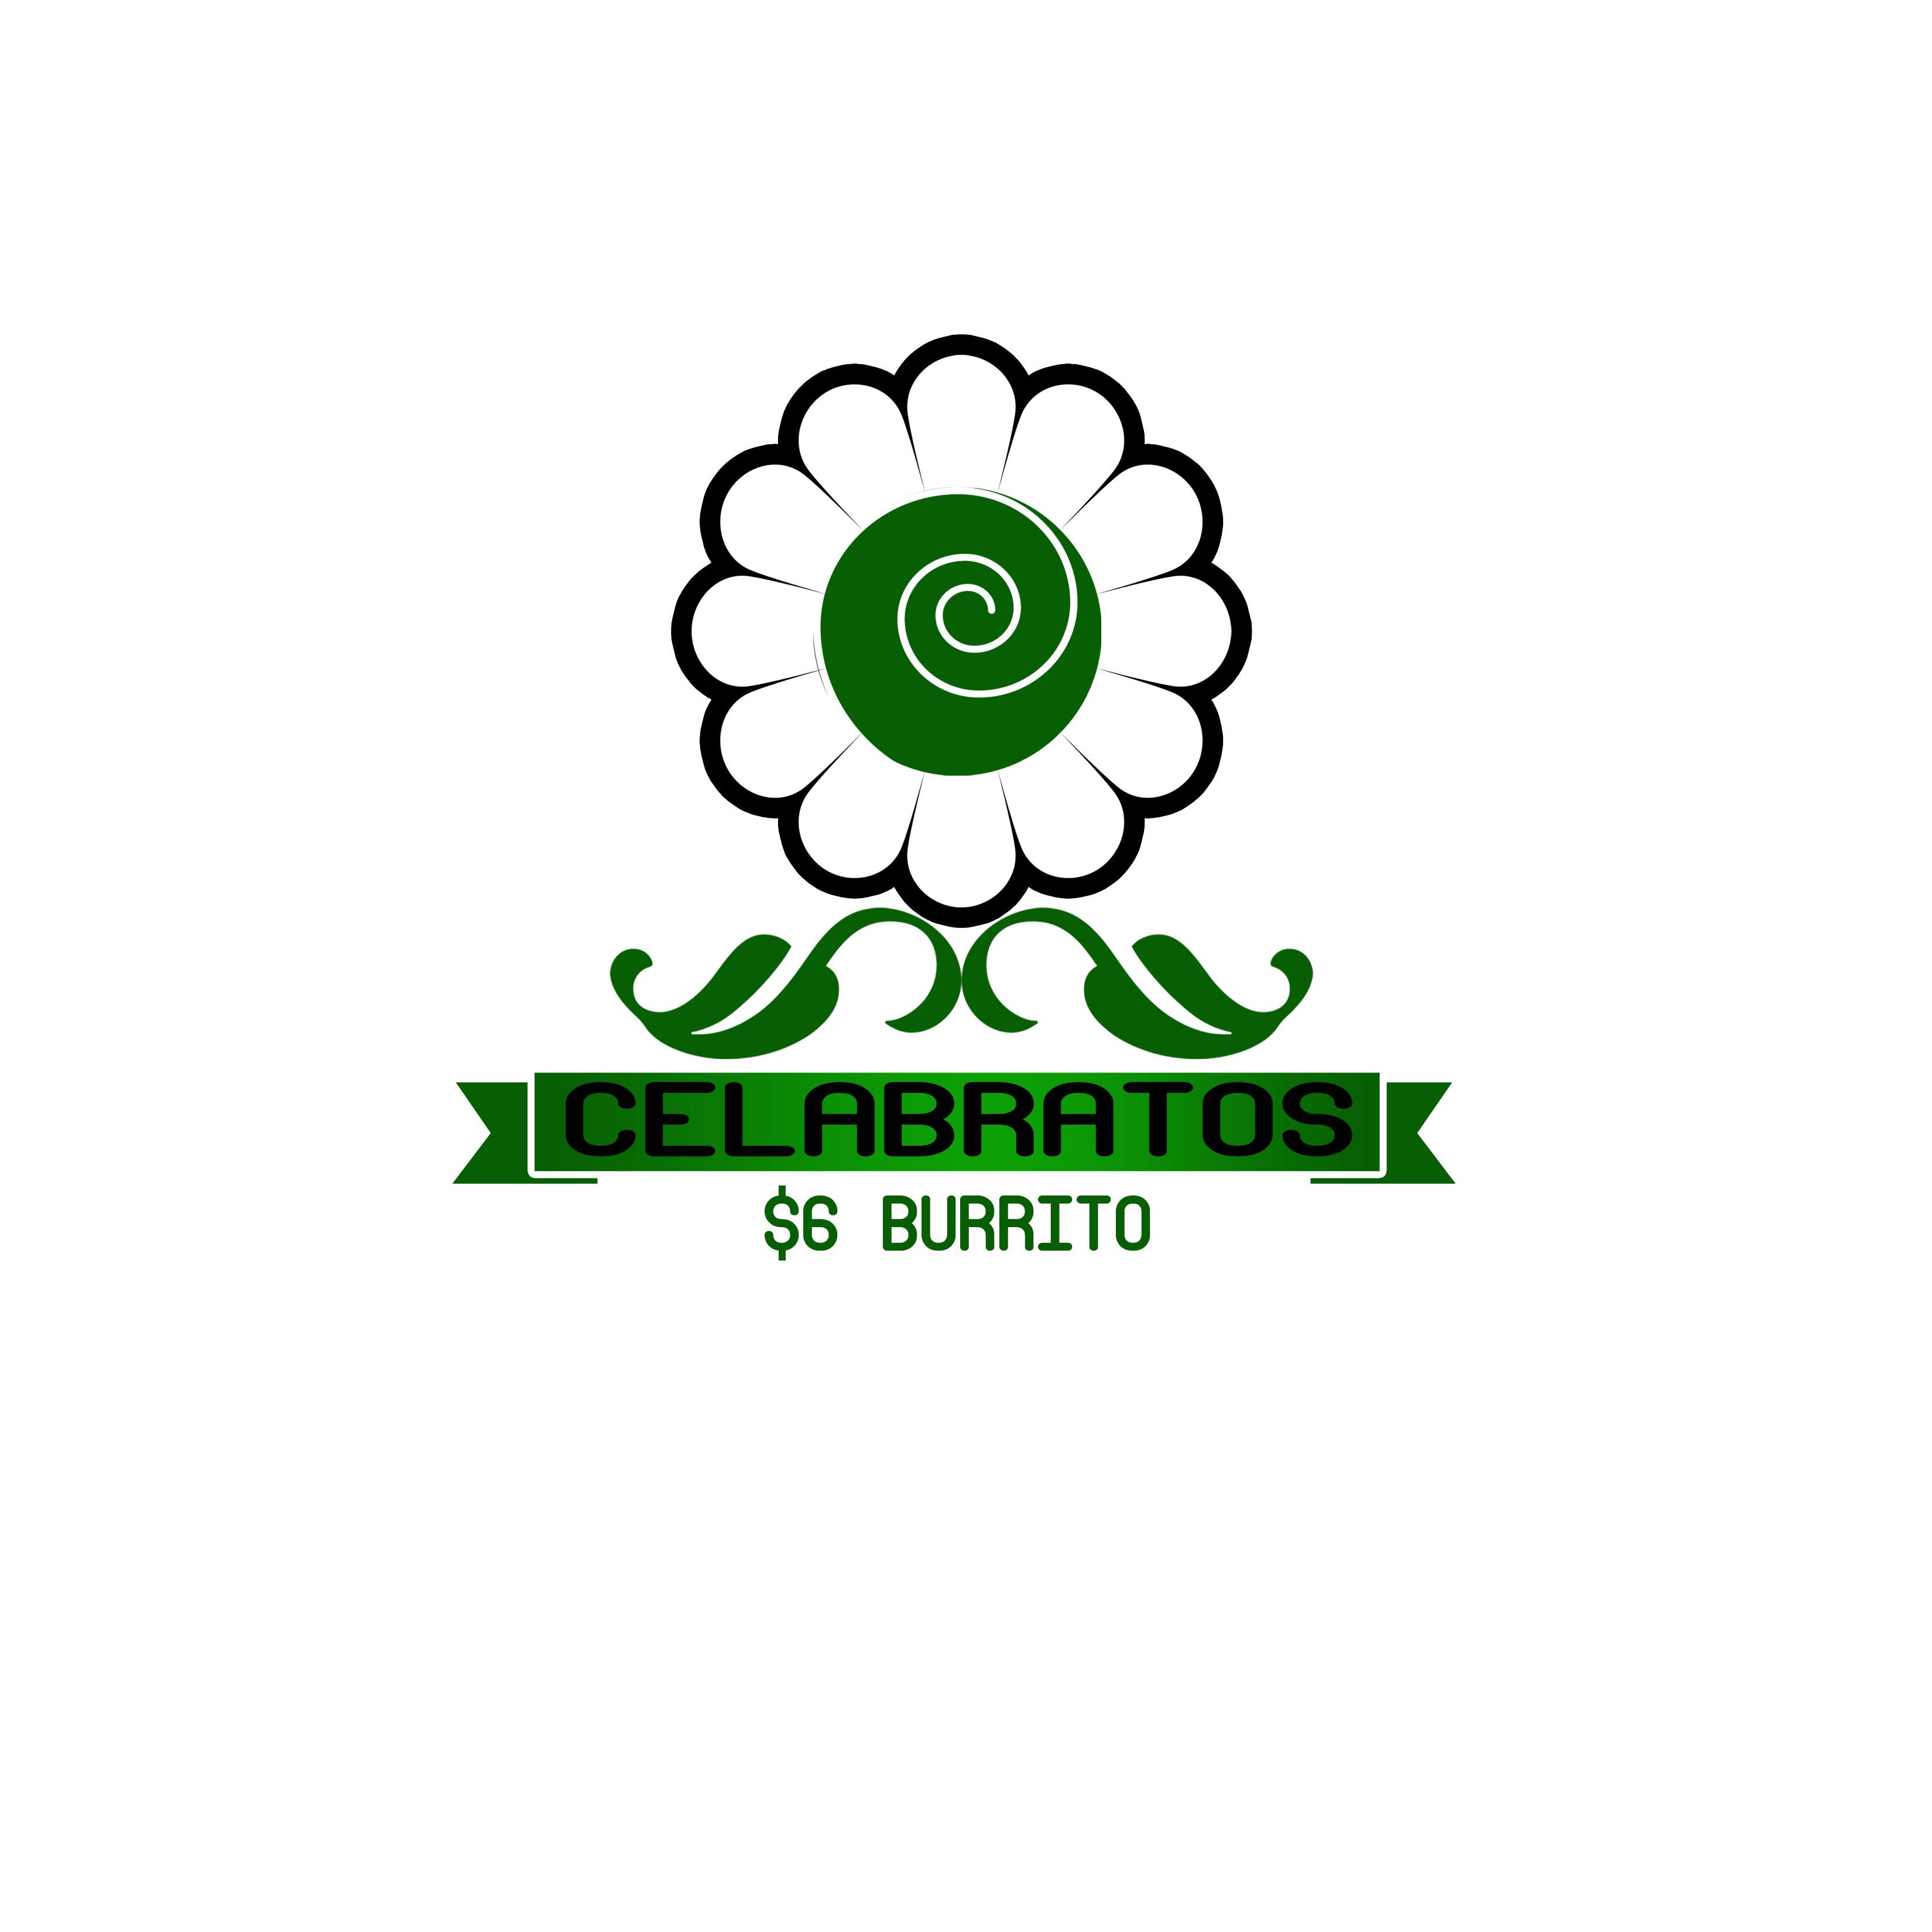 Logo Design by Allan Esclamado - Entry No. 64 in the Logo Design Contest Imaginative Logo Design for Celabratos.